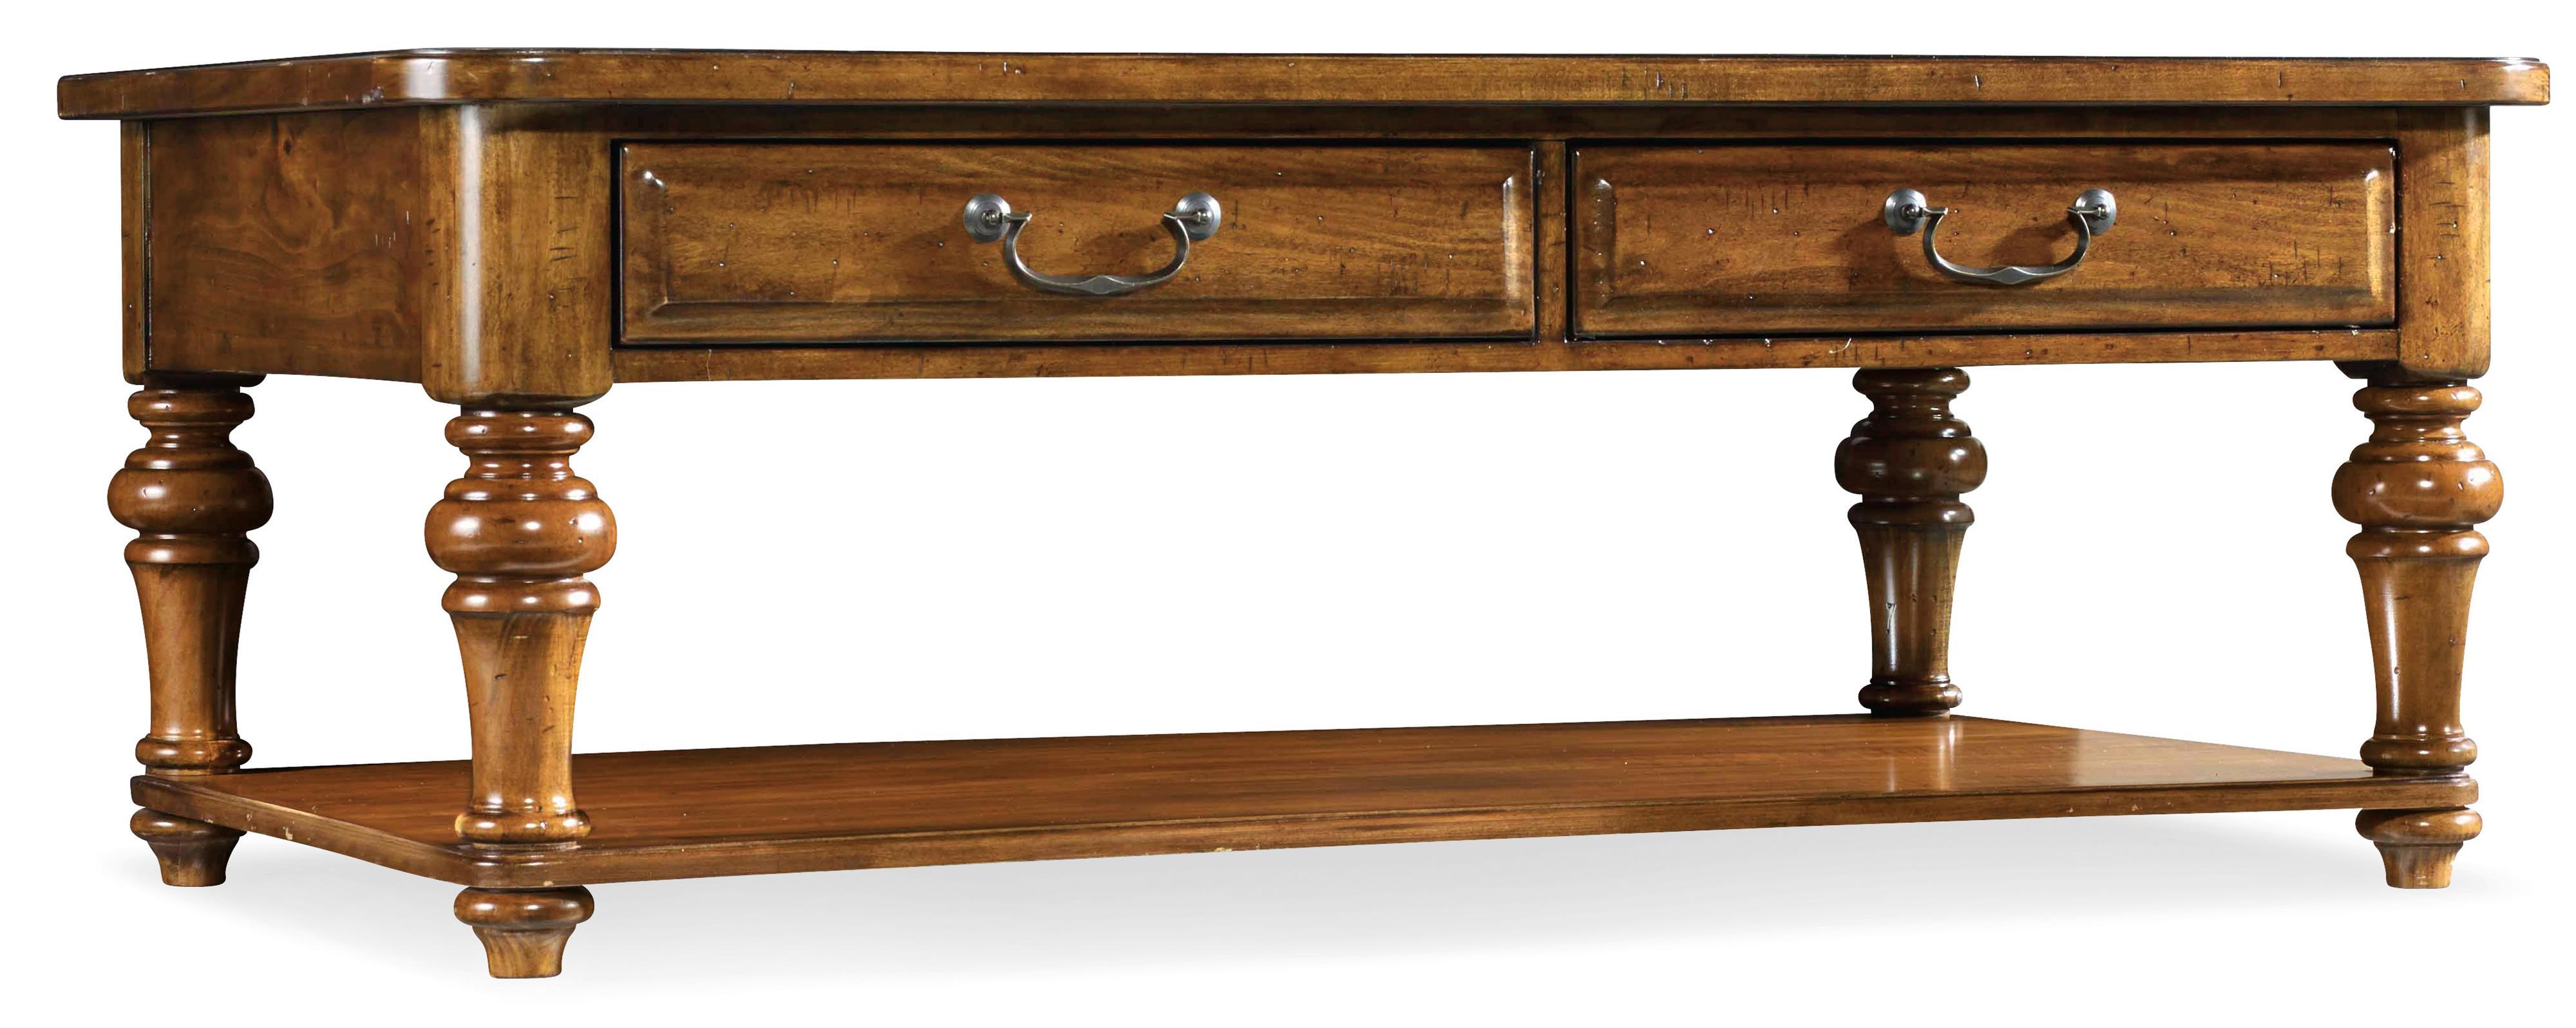 Hooker Furniture Tynecastle Cocktail Table - Item Number: 5323-80110